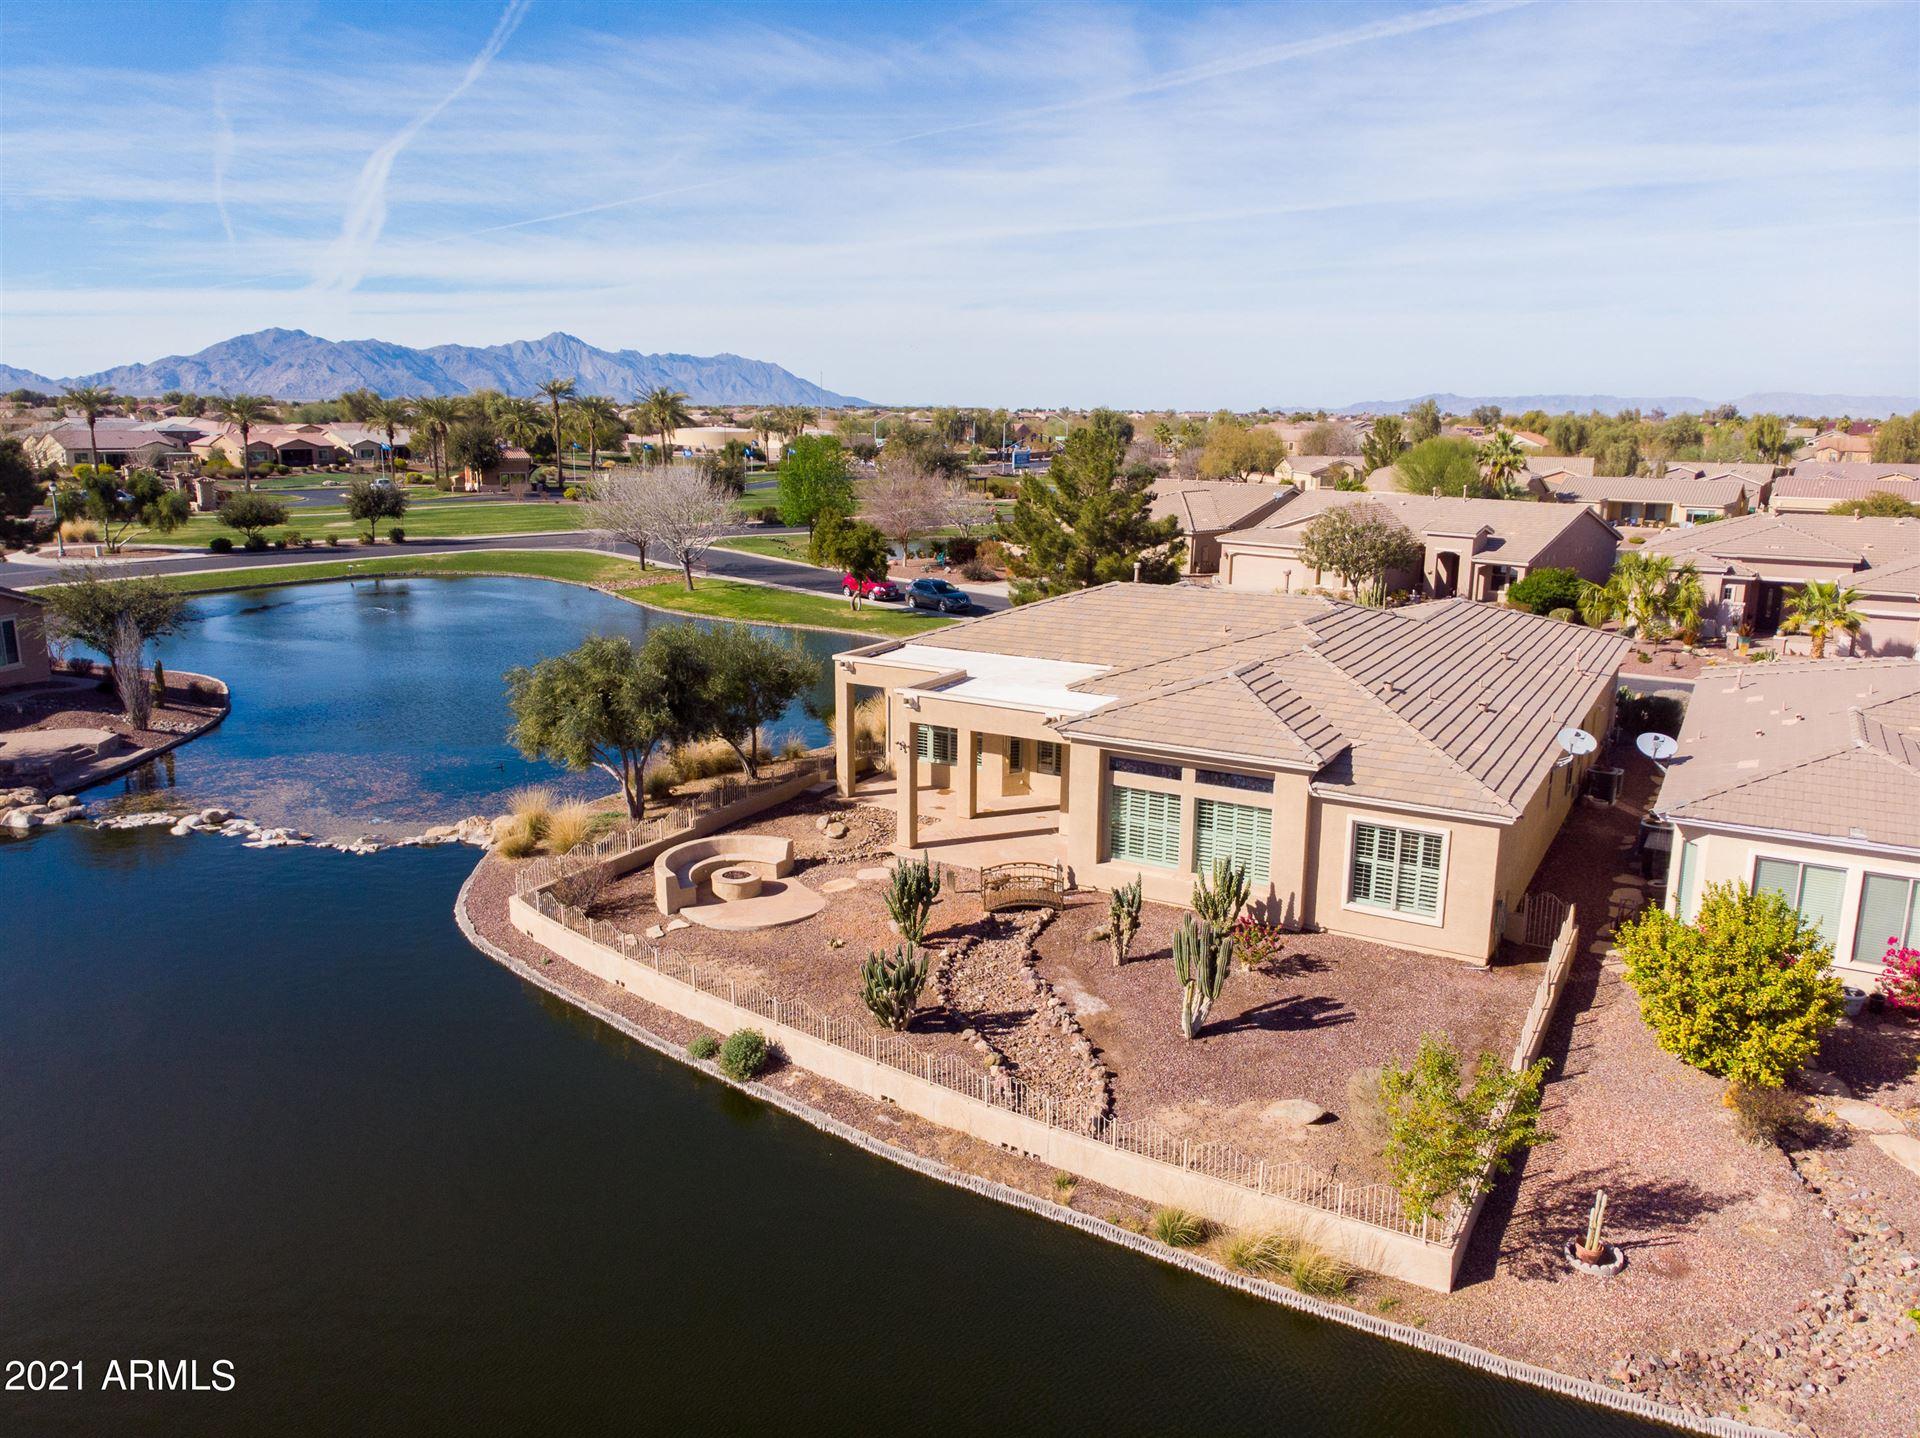 42591 W BLUE SUEDE SHOES Lane, Maricopa, AZ 85138 - MLS#: 6186972